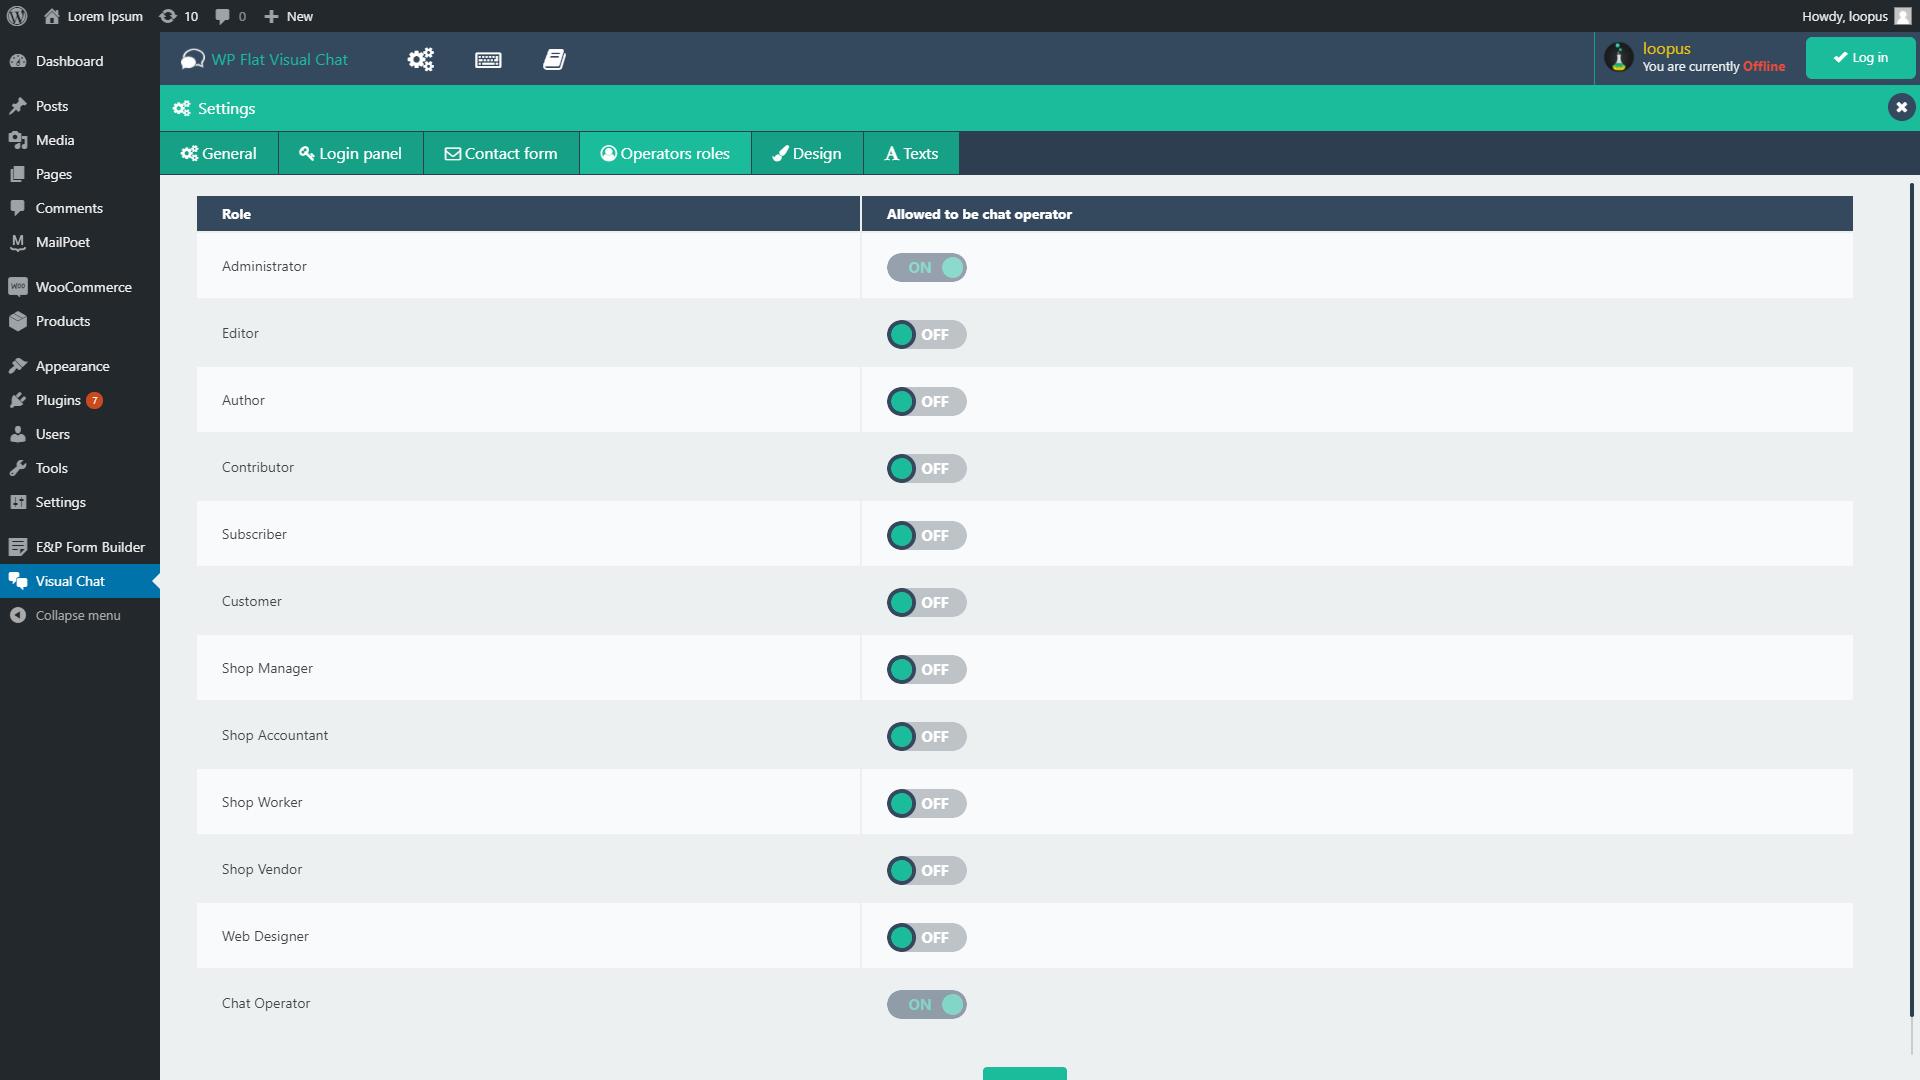 افزونه WP Flat Visual Chat | دانلود افزونه چت آنلاین وردپرس